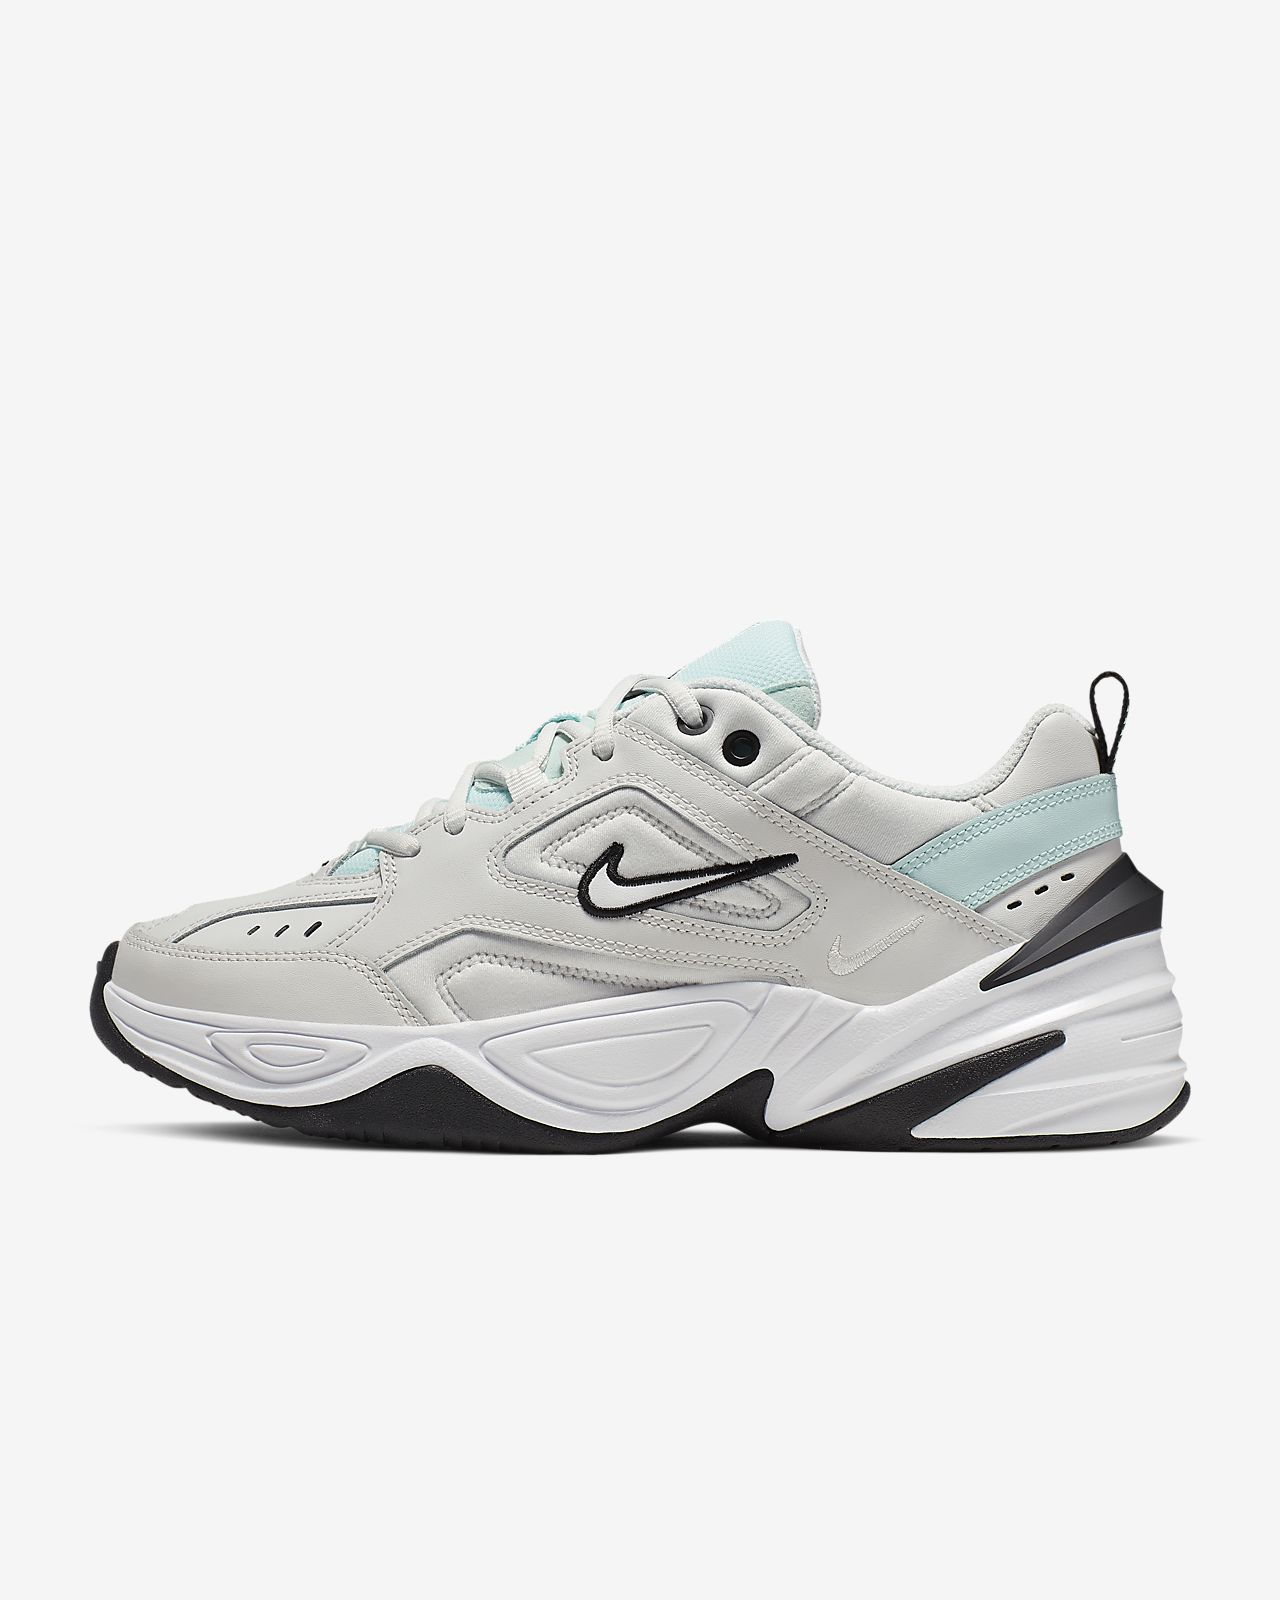 1f619f3676f Low Resolution Sapatilhas Nike M2K Tekno Sapatilhas Nike M2K Tekno